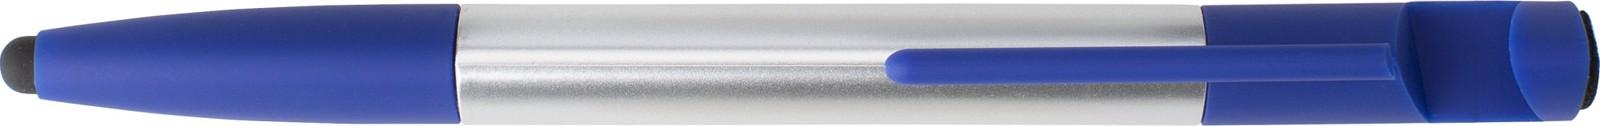 ABS 6-in-1 ballpen - Blue / Silver